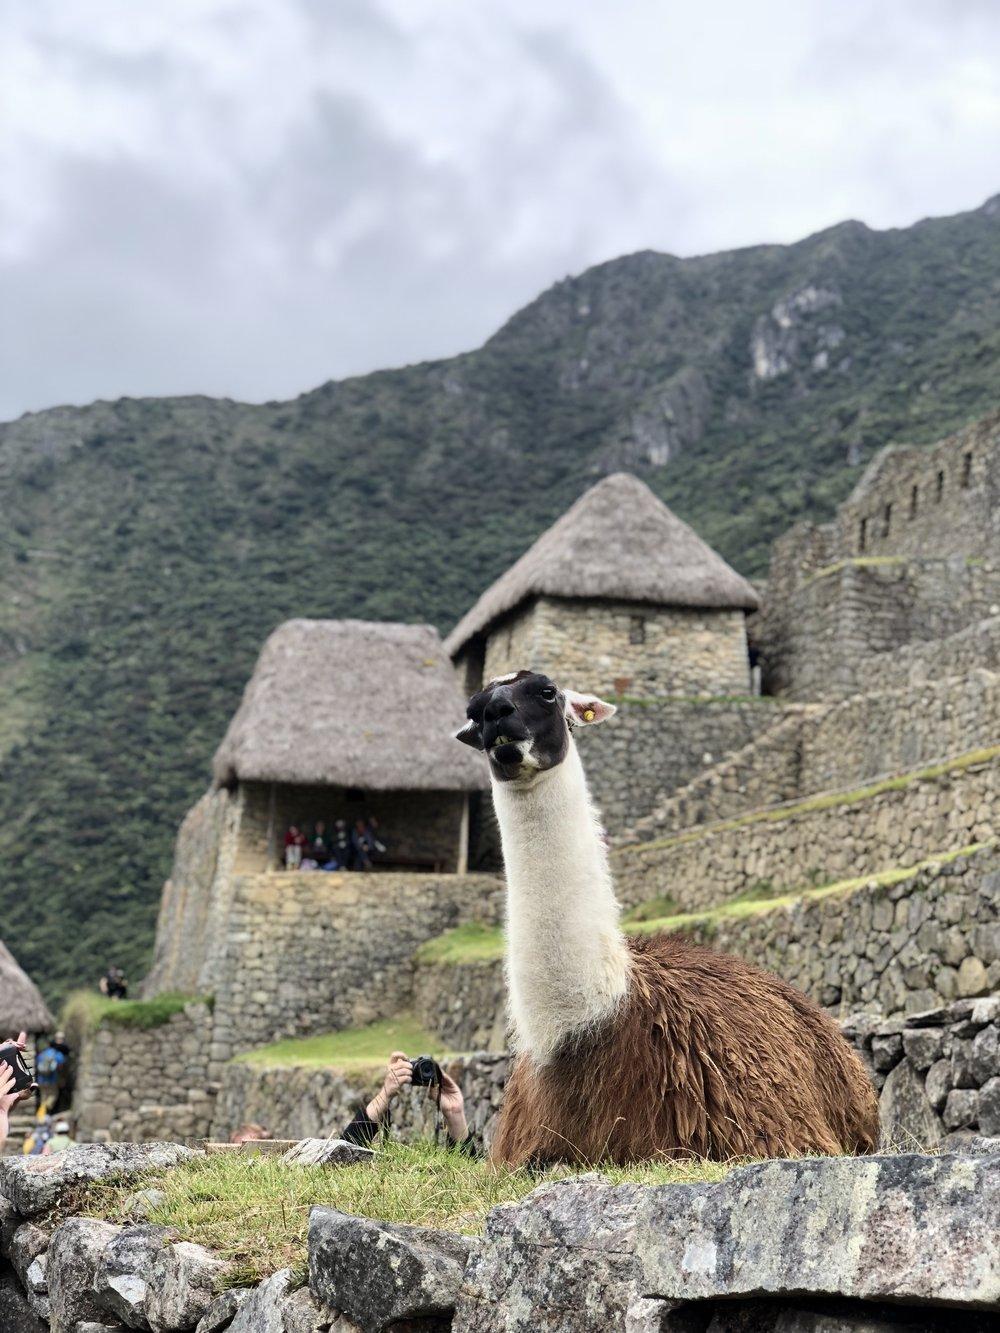 Precious llamas all around the Machu Picchu site!